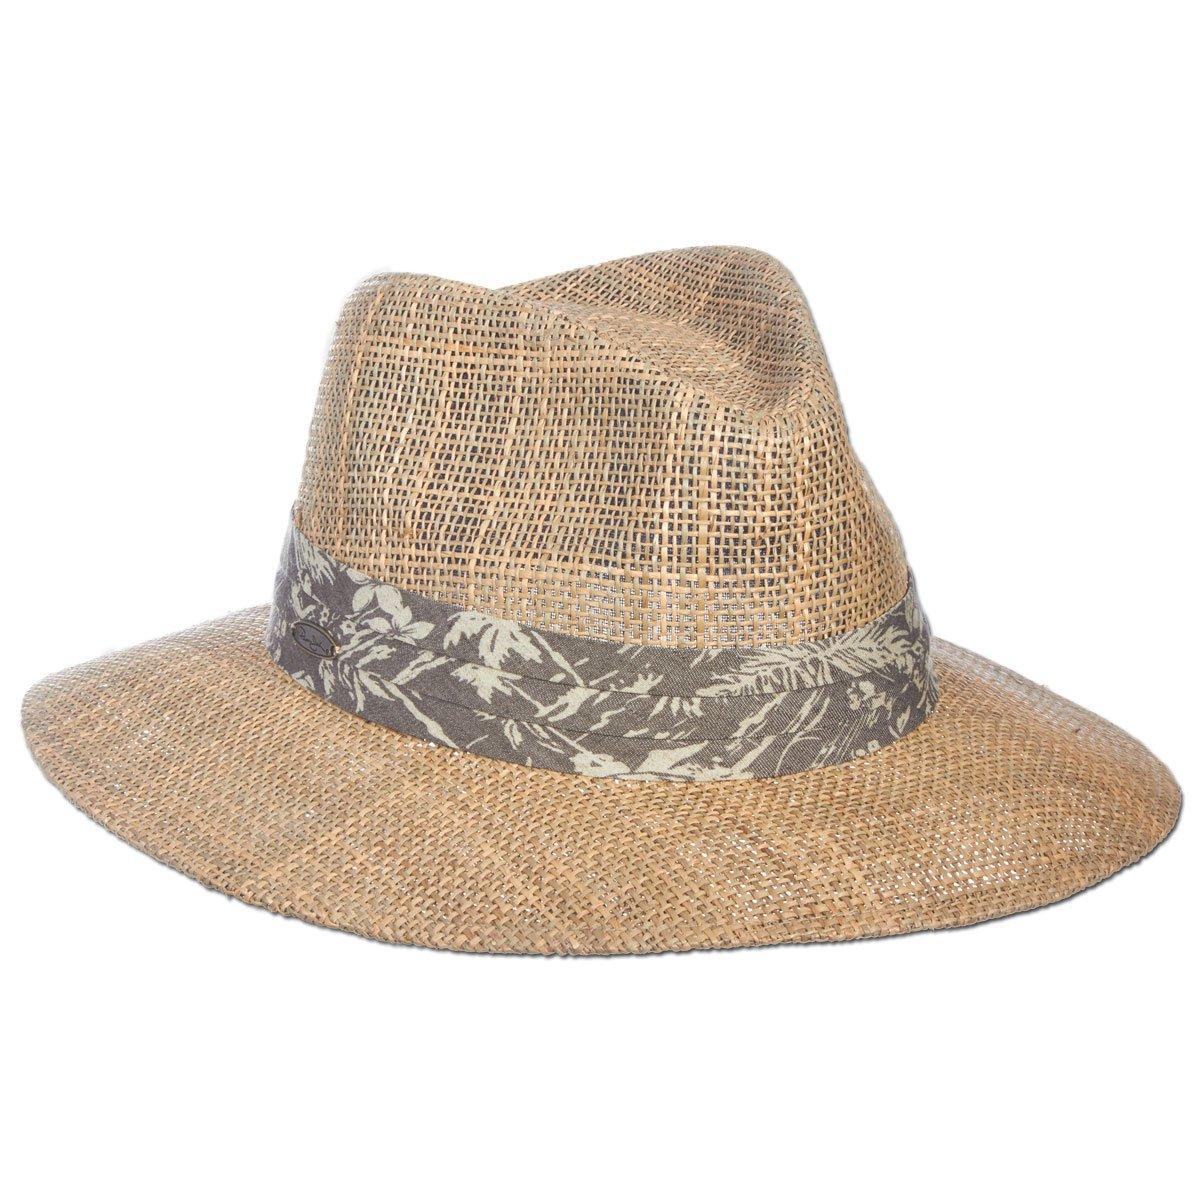 Panama Jack Dos Sombras Matte Seagrass Straw Safari Sun Hat with 3-Pleat Ribbon Band